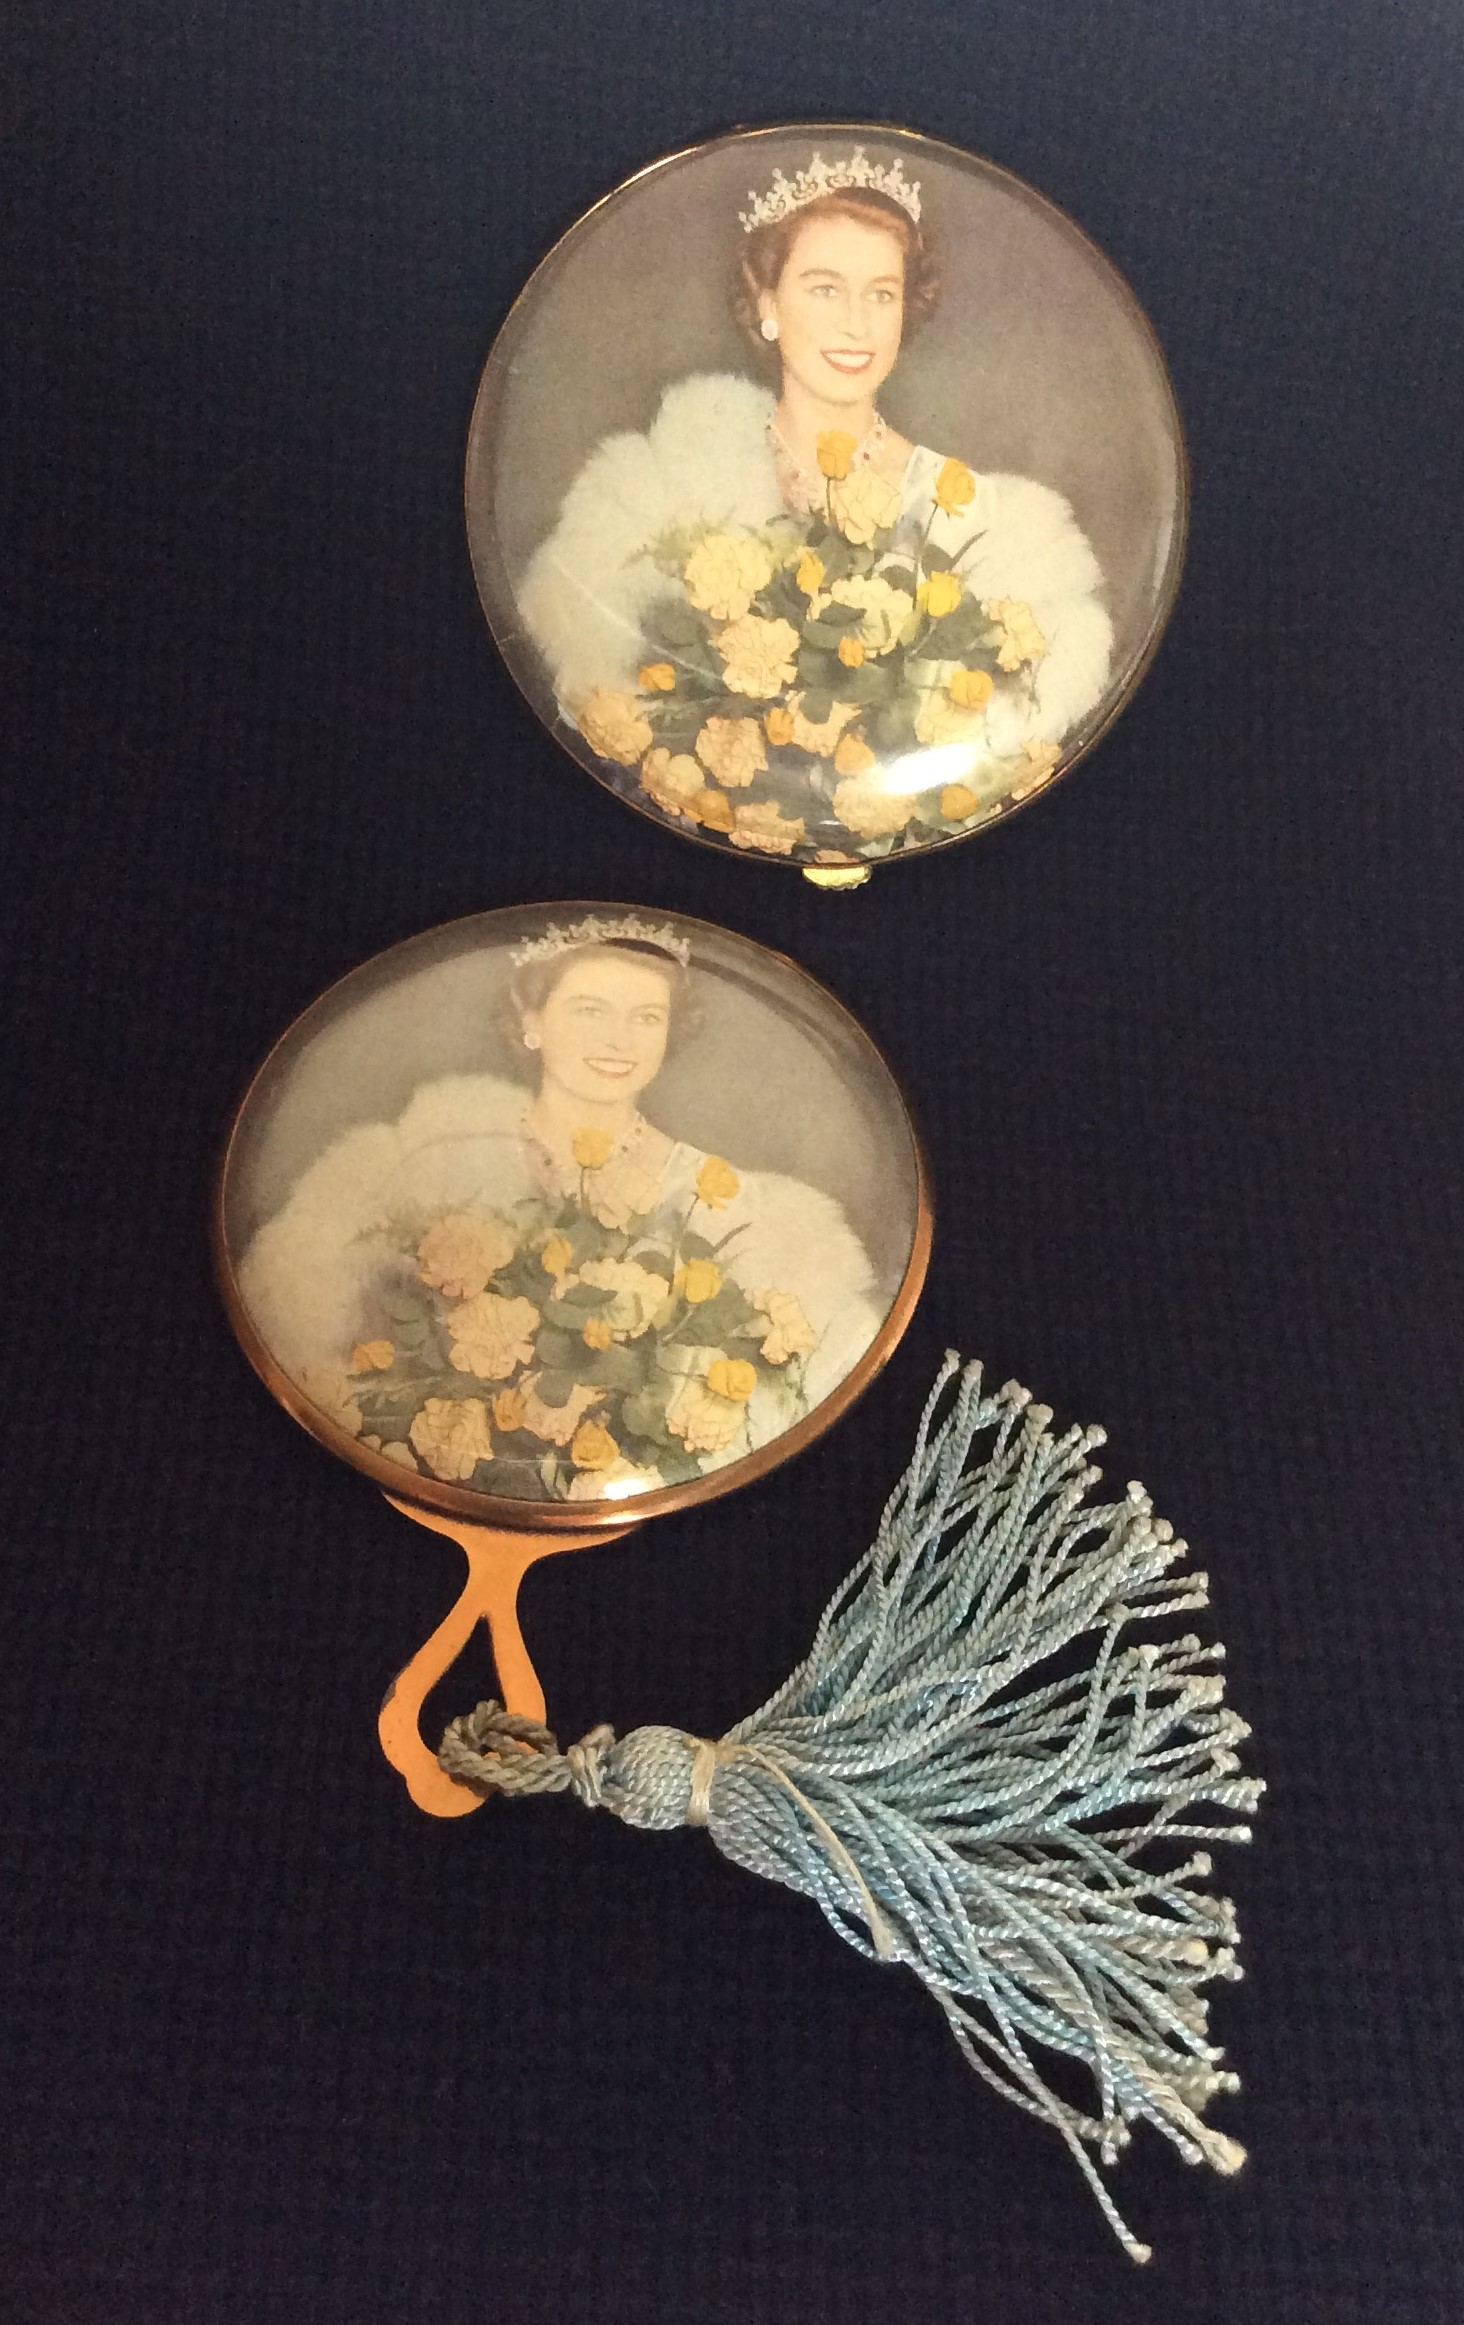 Rare Vintage Queen Elizabeth 11 Coronation Brass Powder Compact with Matching Handbag Mirror